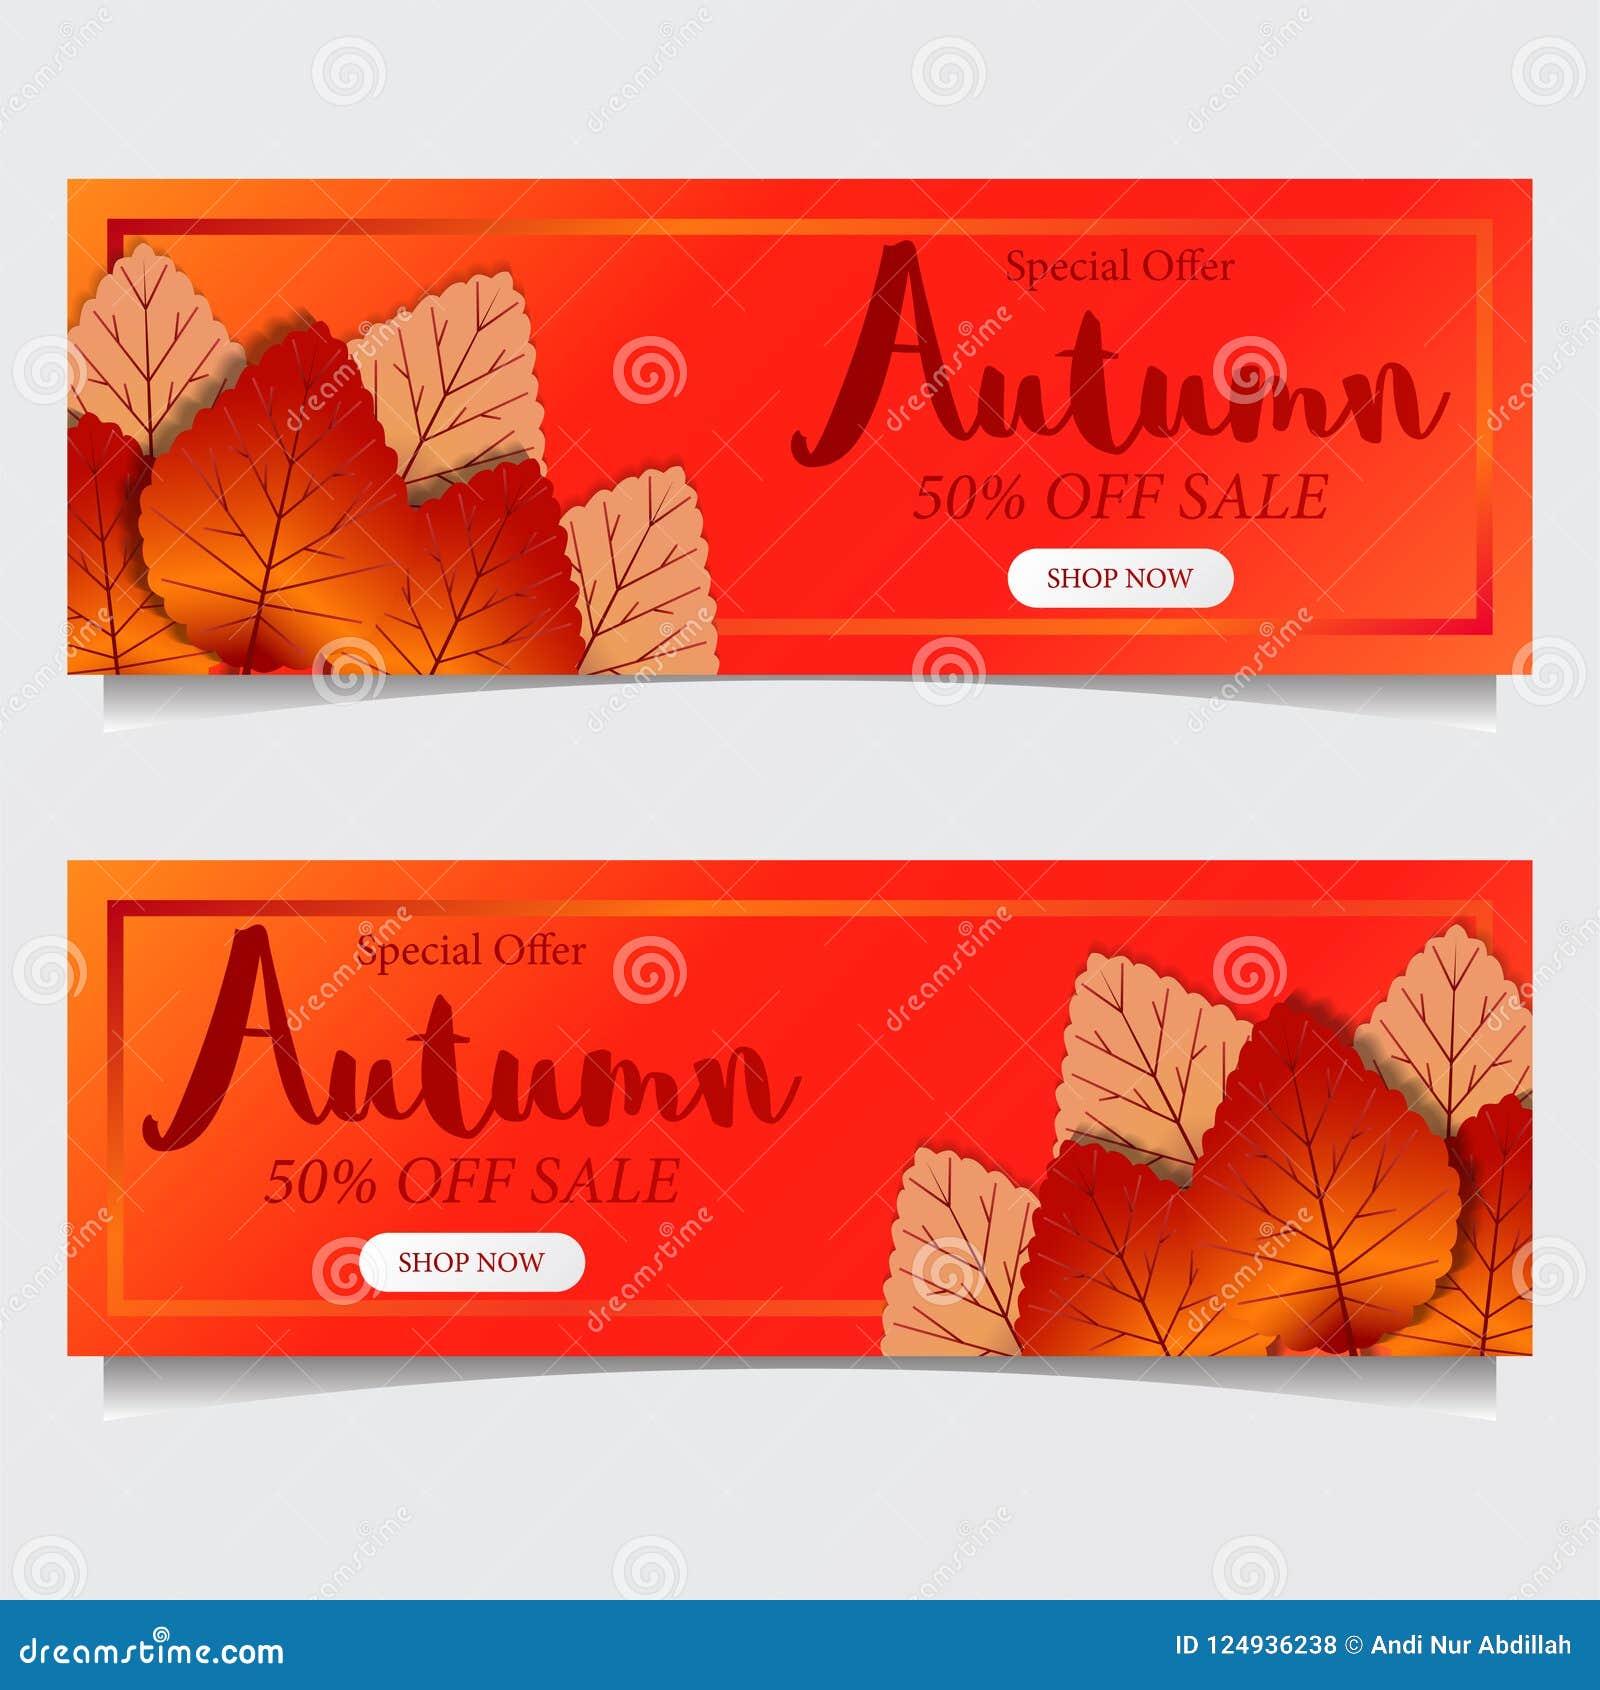 Падение листьев осени с красной оранжевой предпосылкой шаблон предложения продажи Шаблон плаката шаблон знамени также вектор иллю